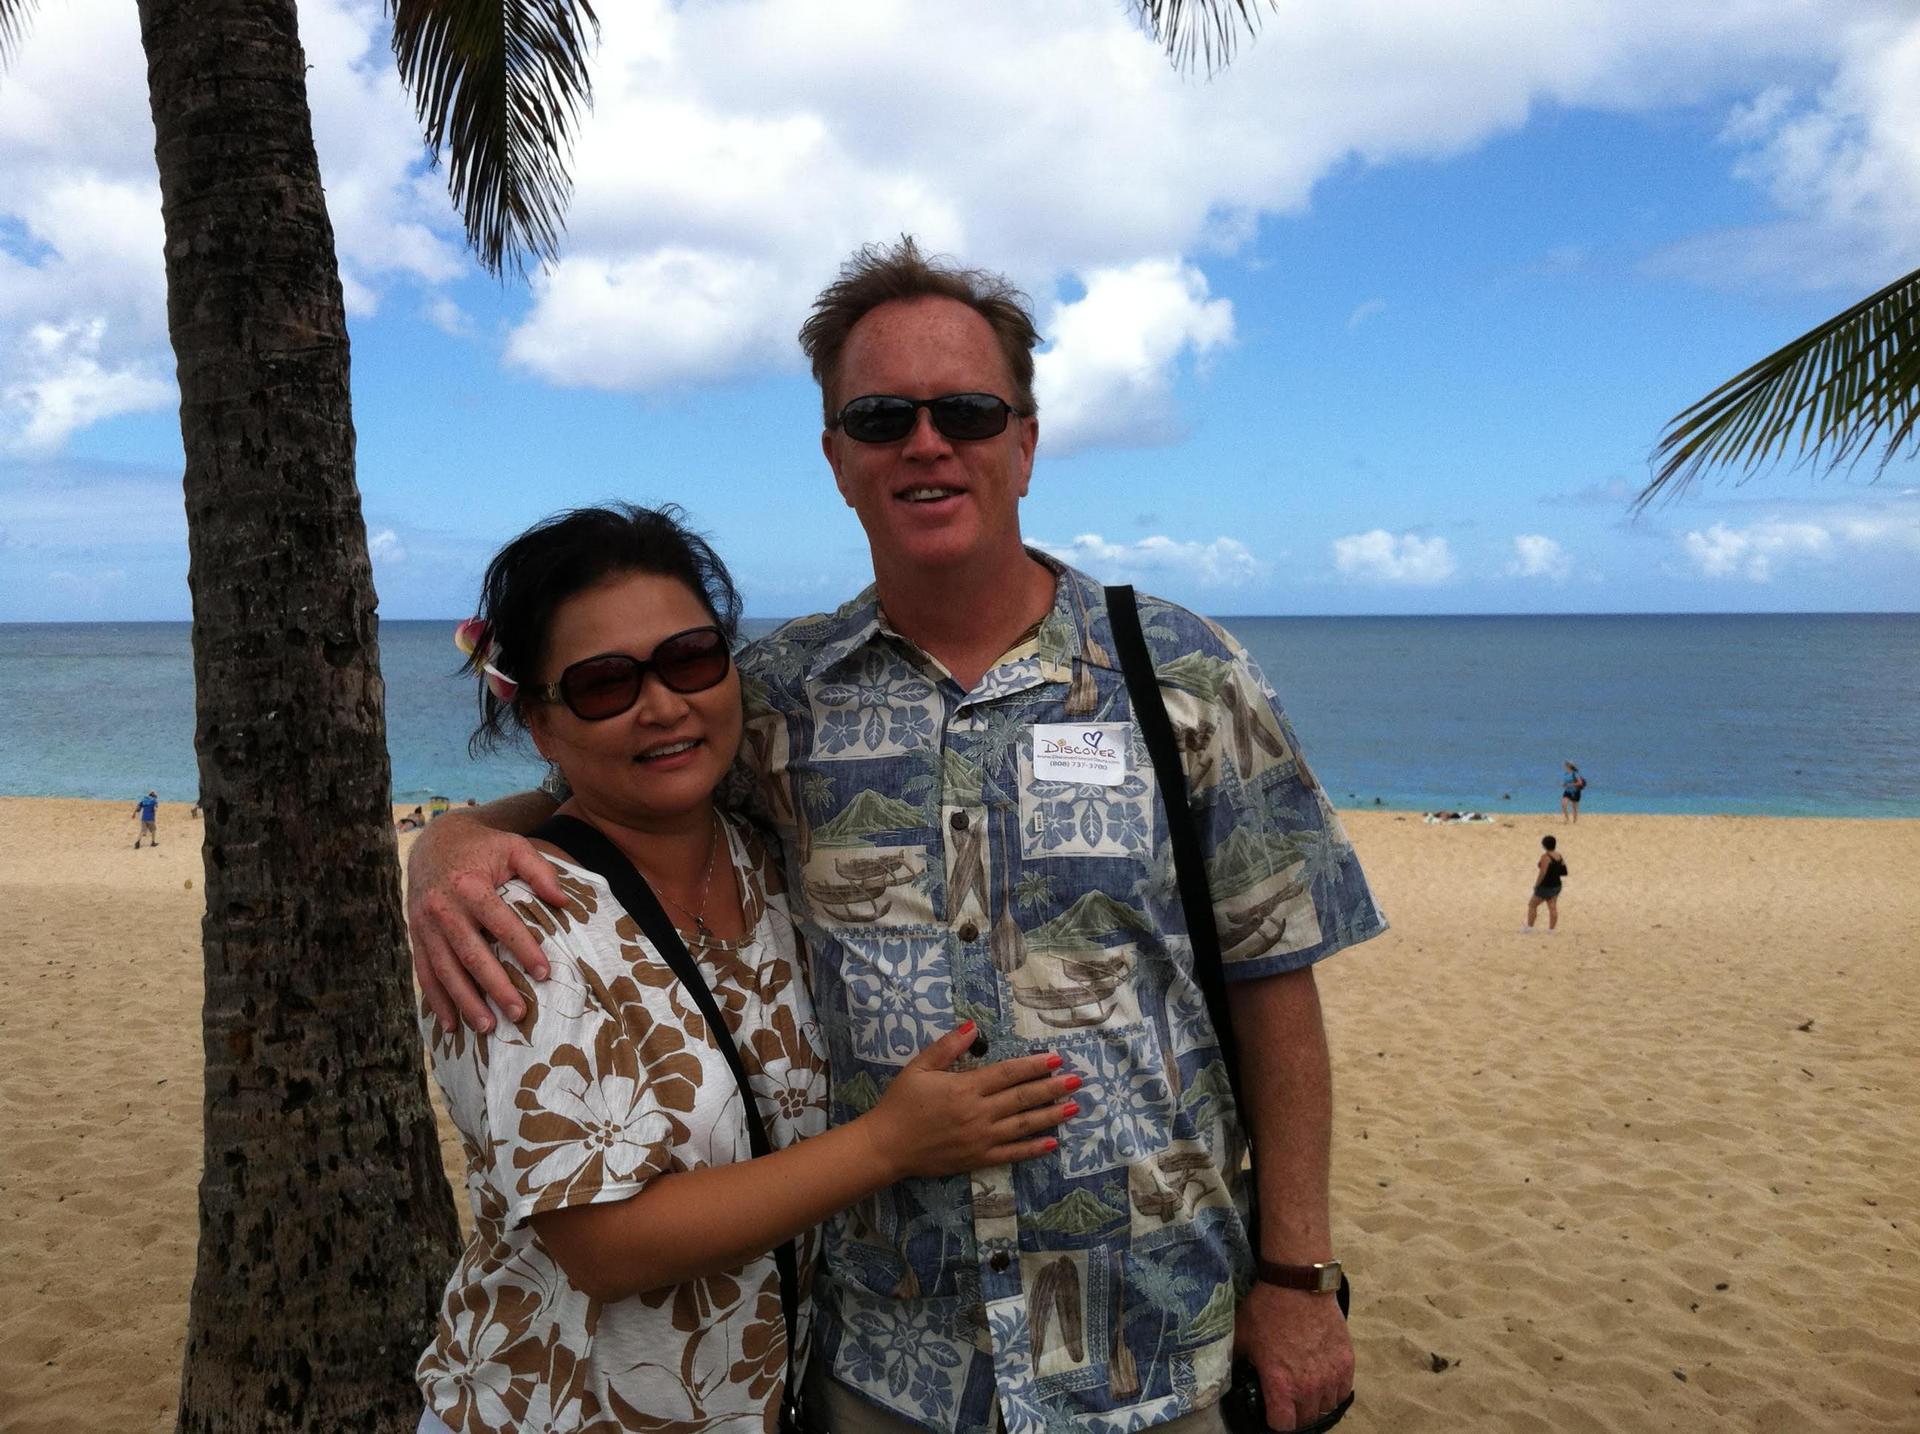 Photo from Hawaii